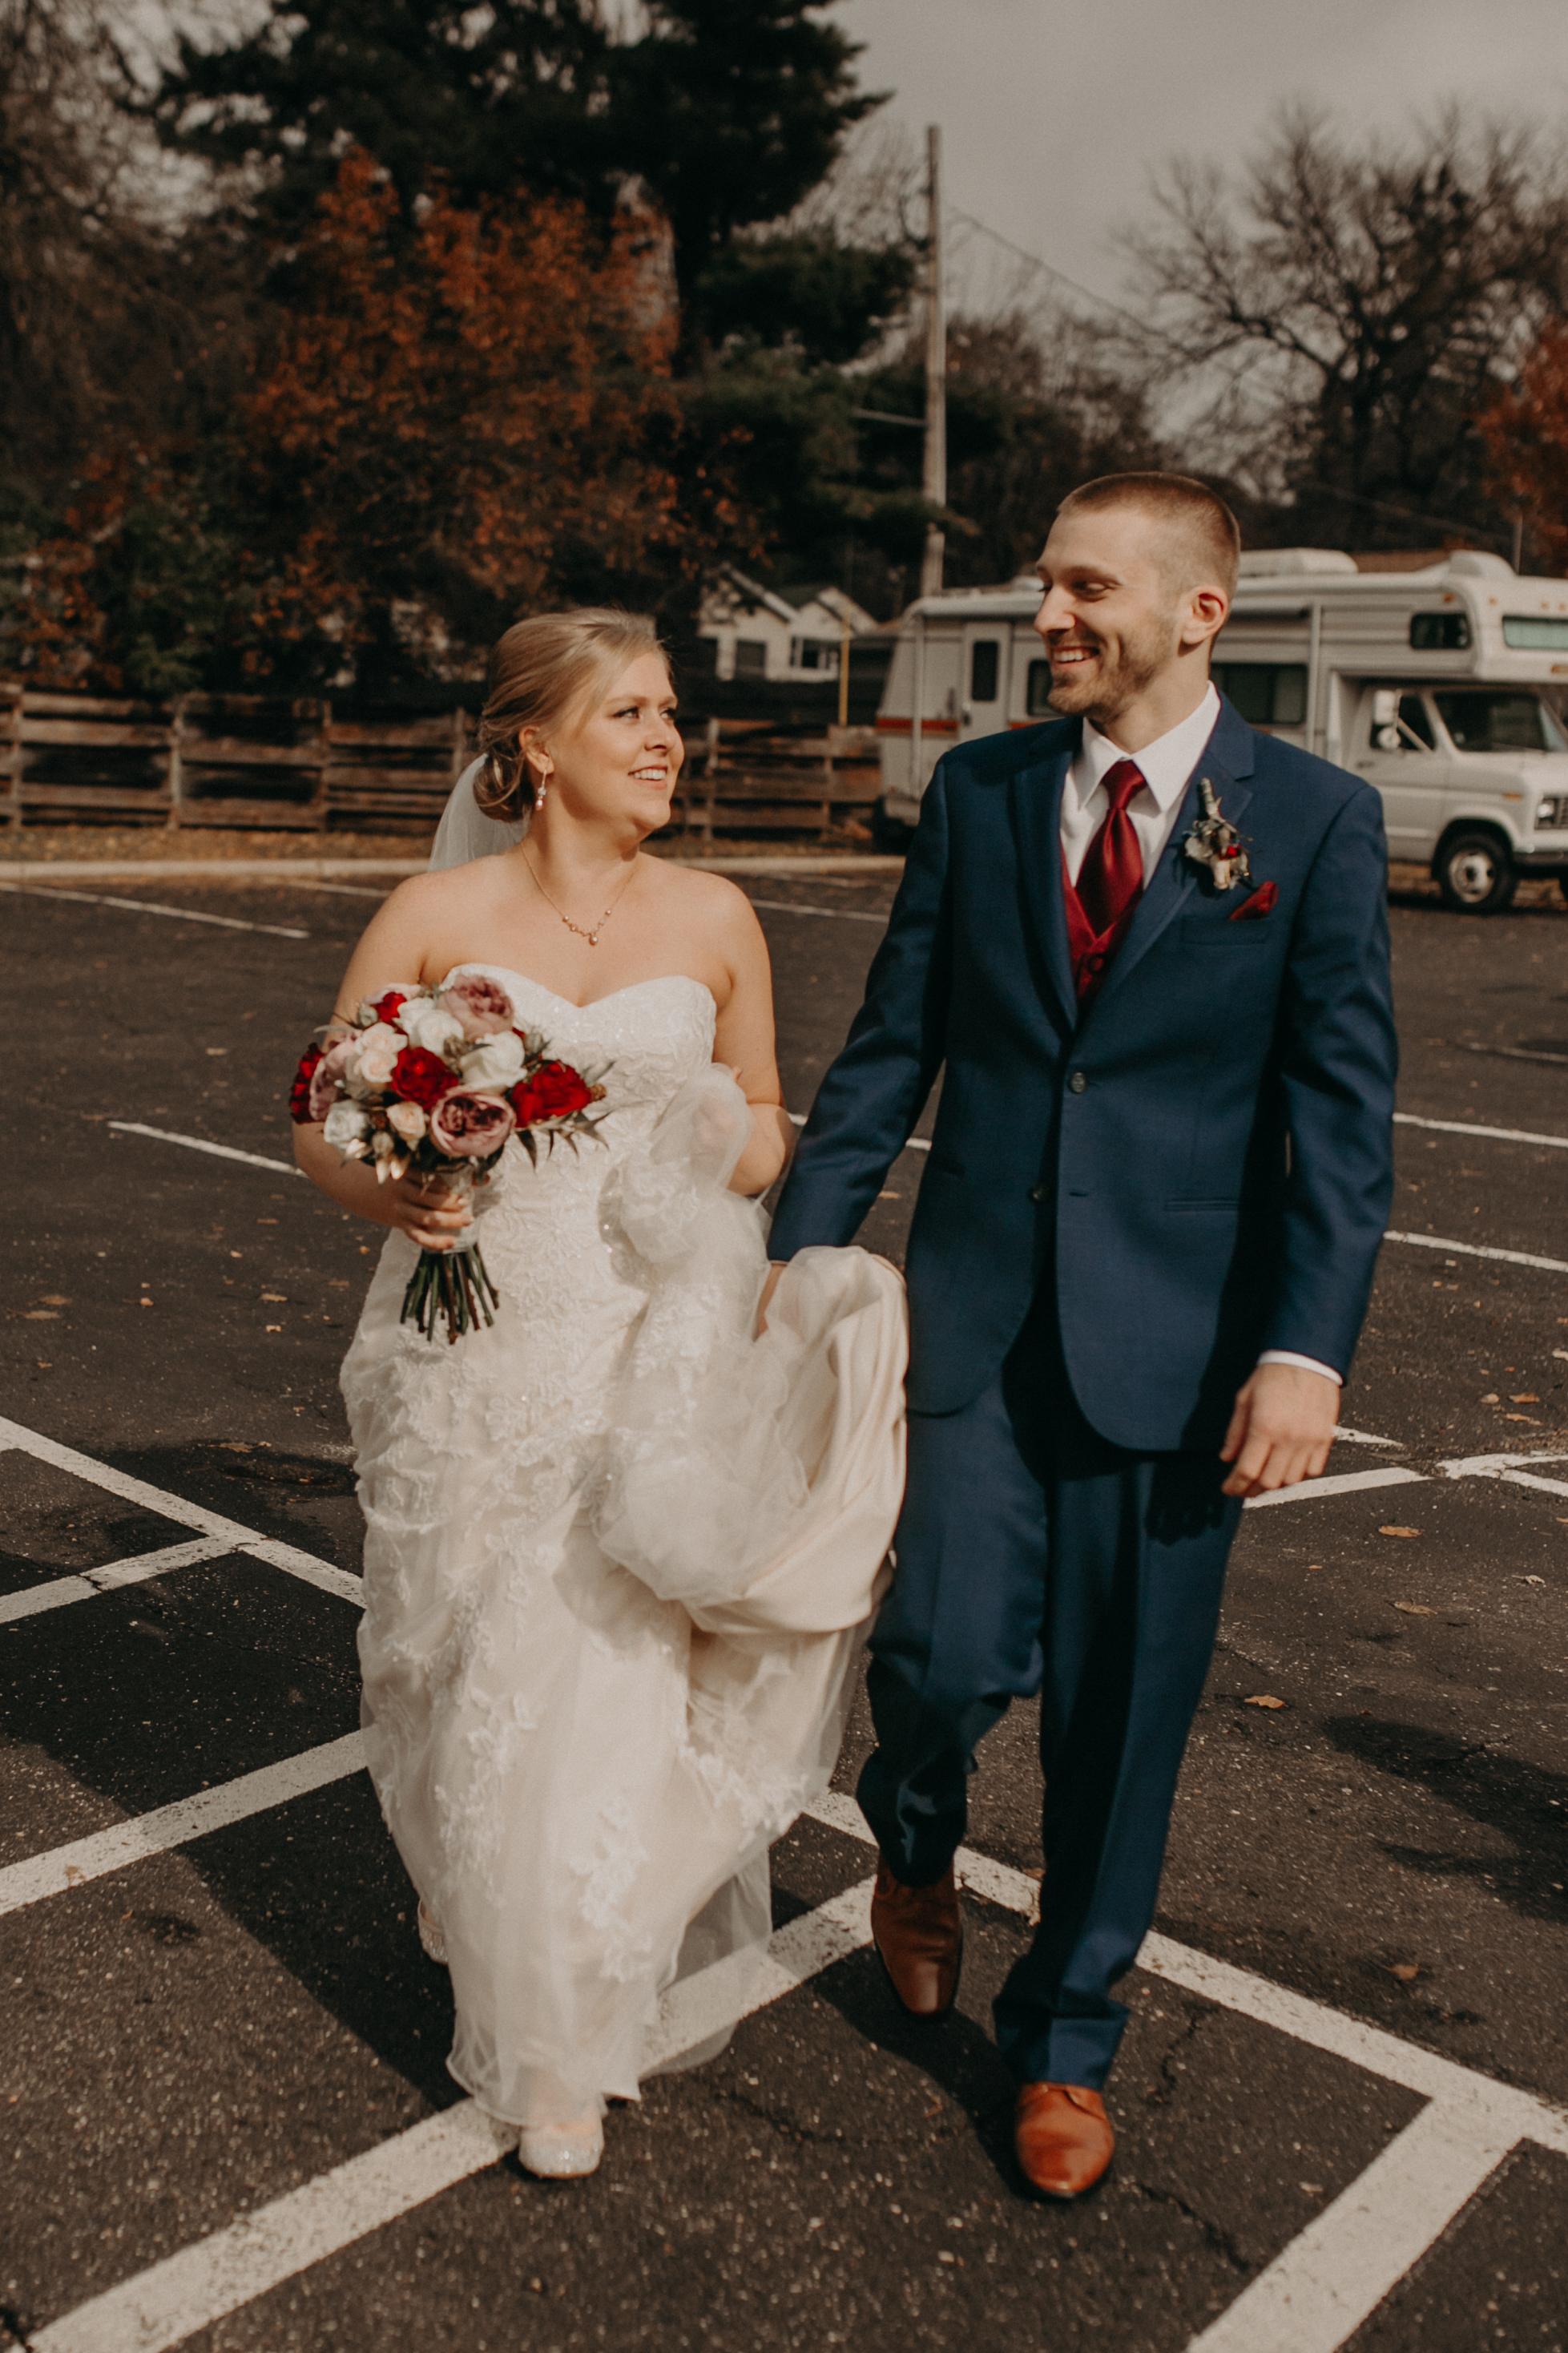 Weisenbeck_Wedding_Oct2018-238.jpg